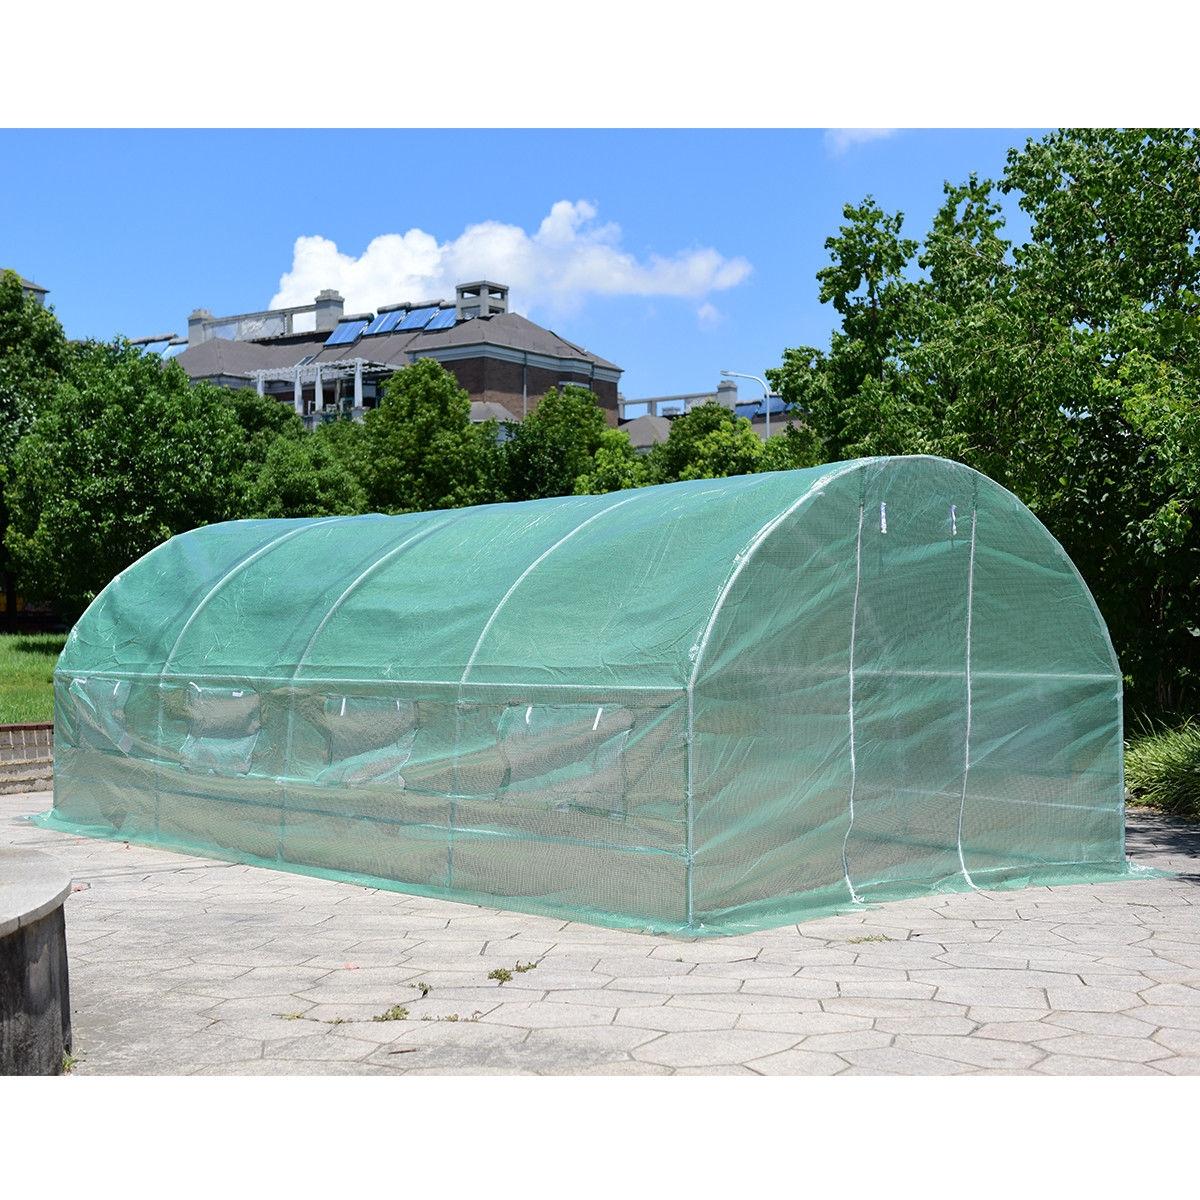 10' x 6.5' x 20' 8 Windows Backyard Walk-in Greenhouse